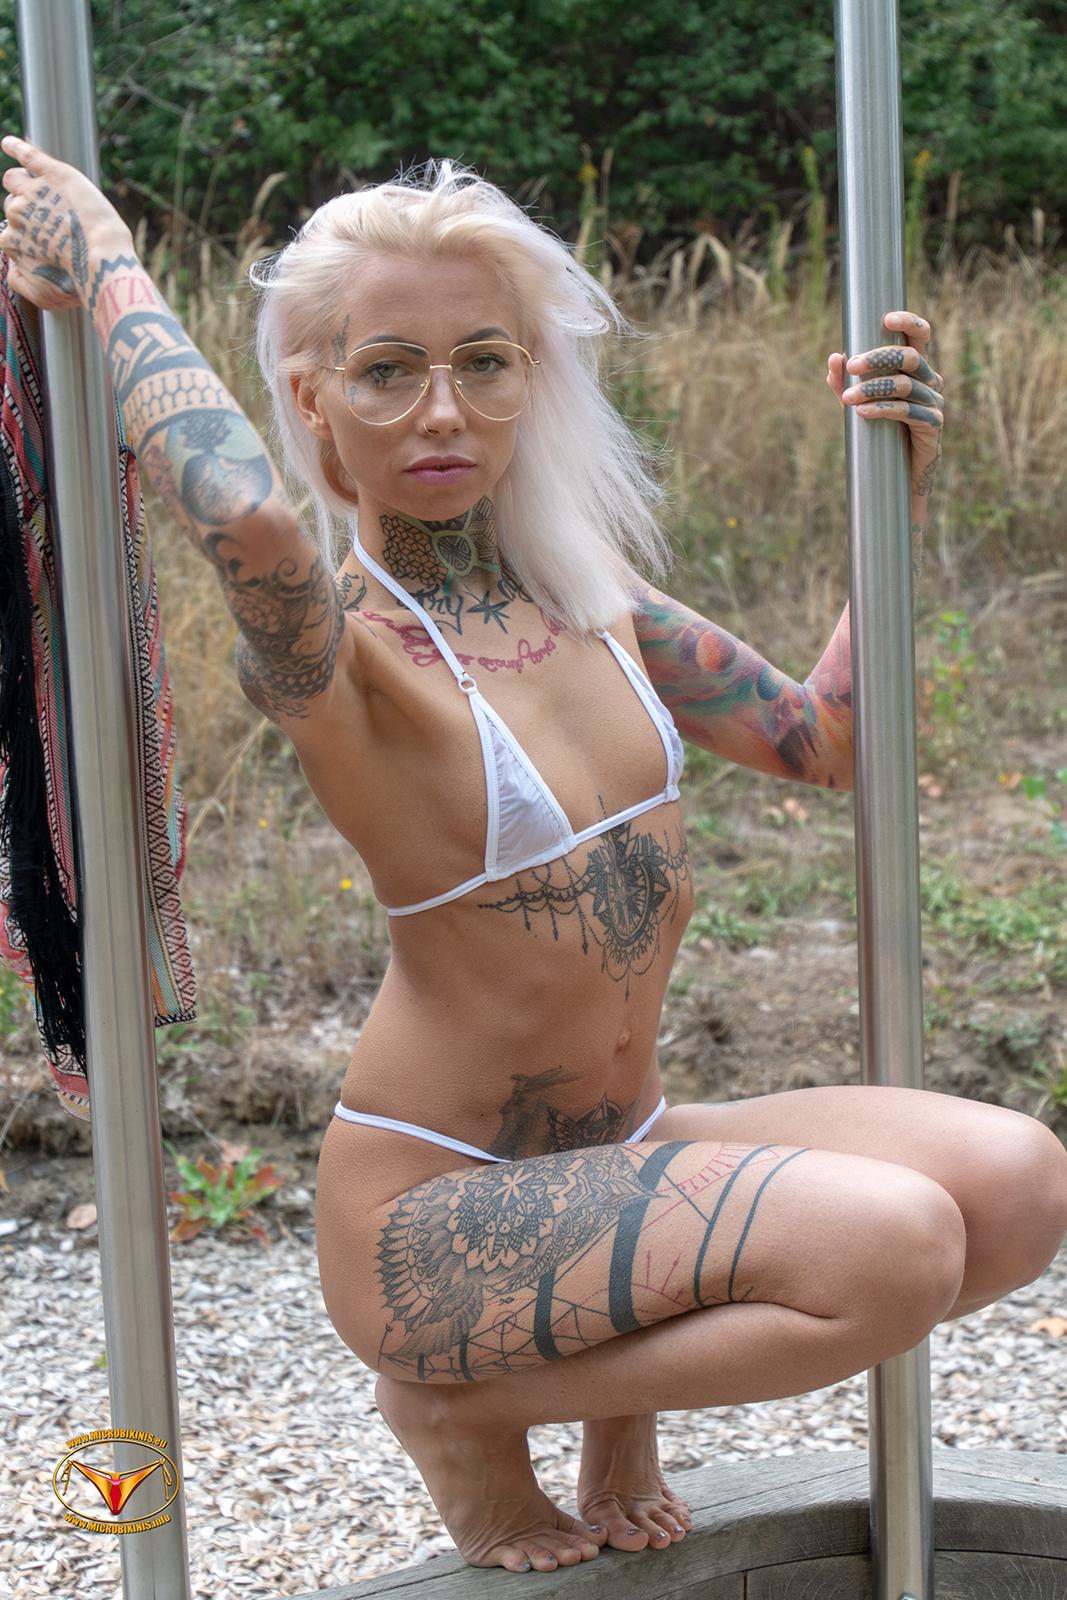 Microbikinis Bikinigirl, Micro Bikini Model SiV-X Bikinigirl from Berlin